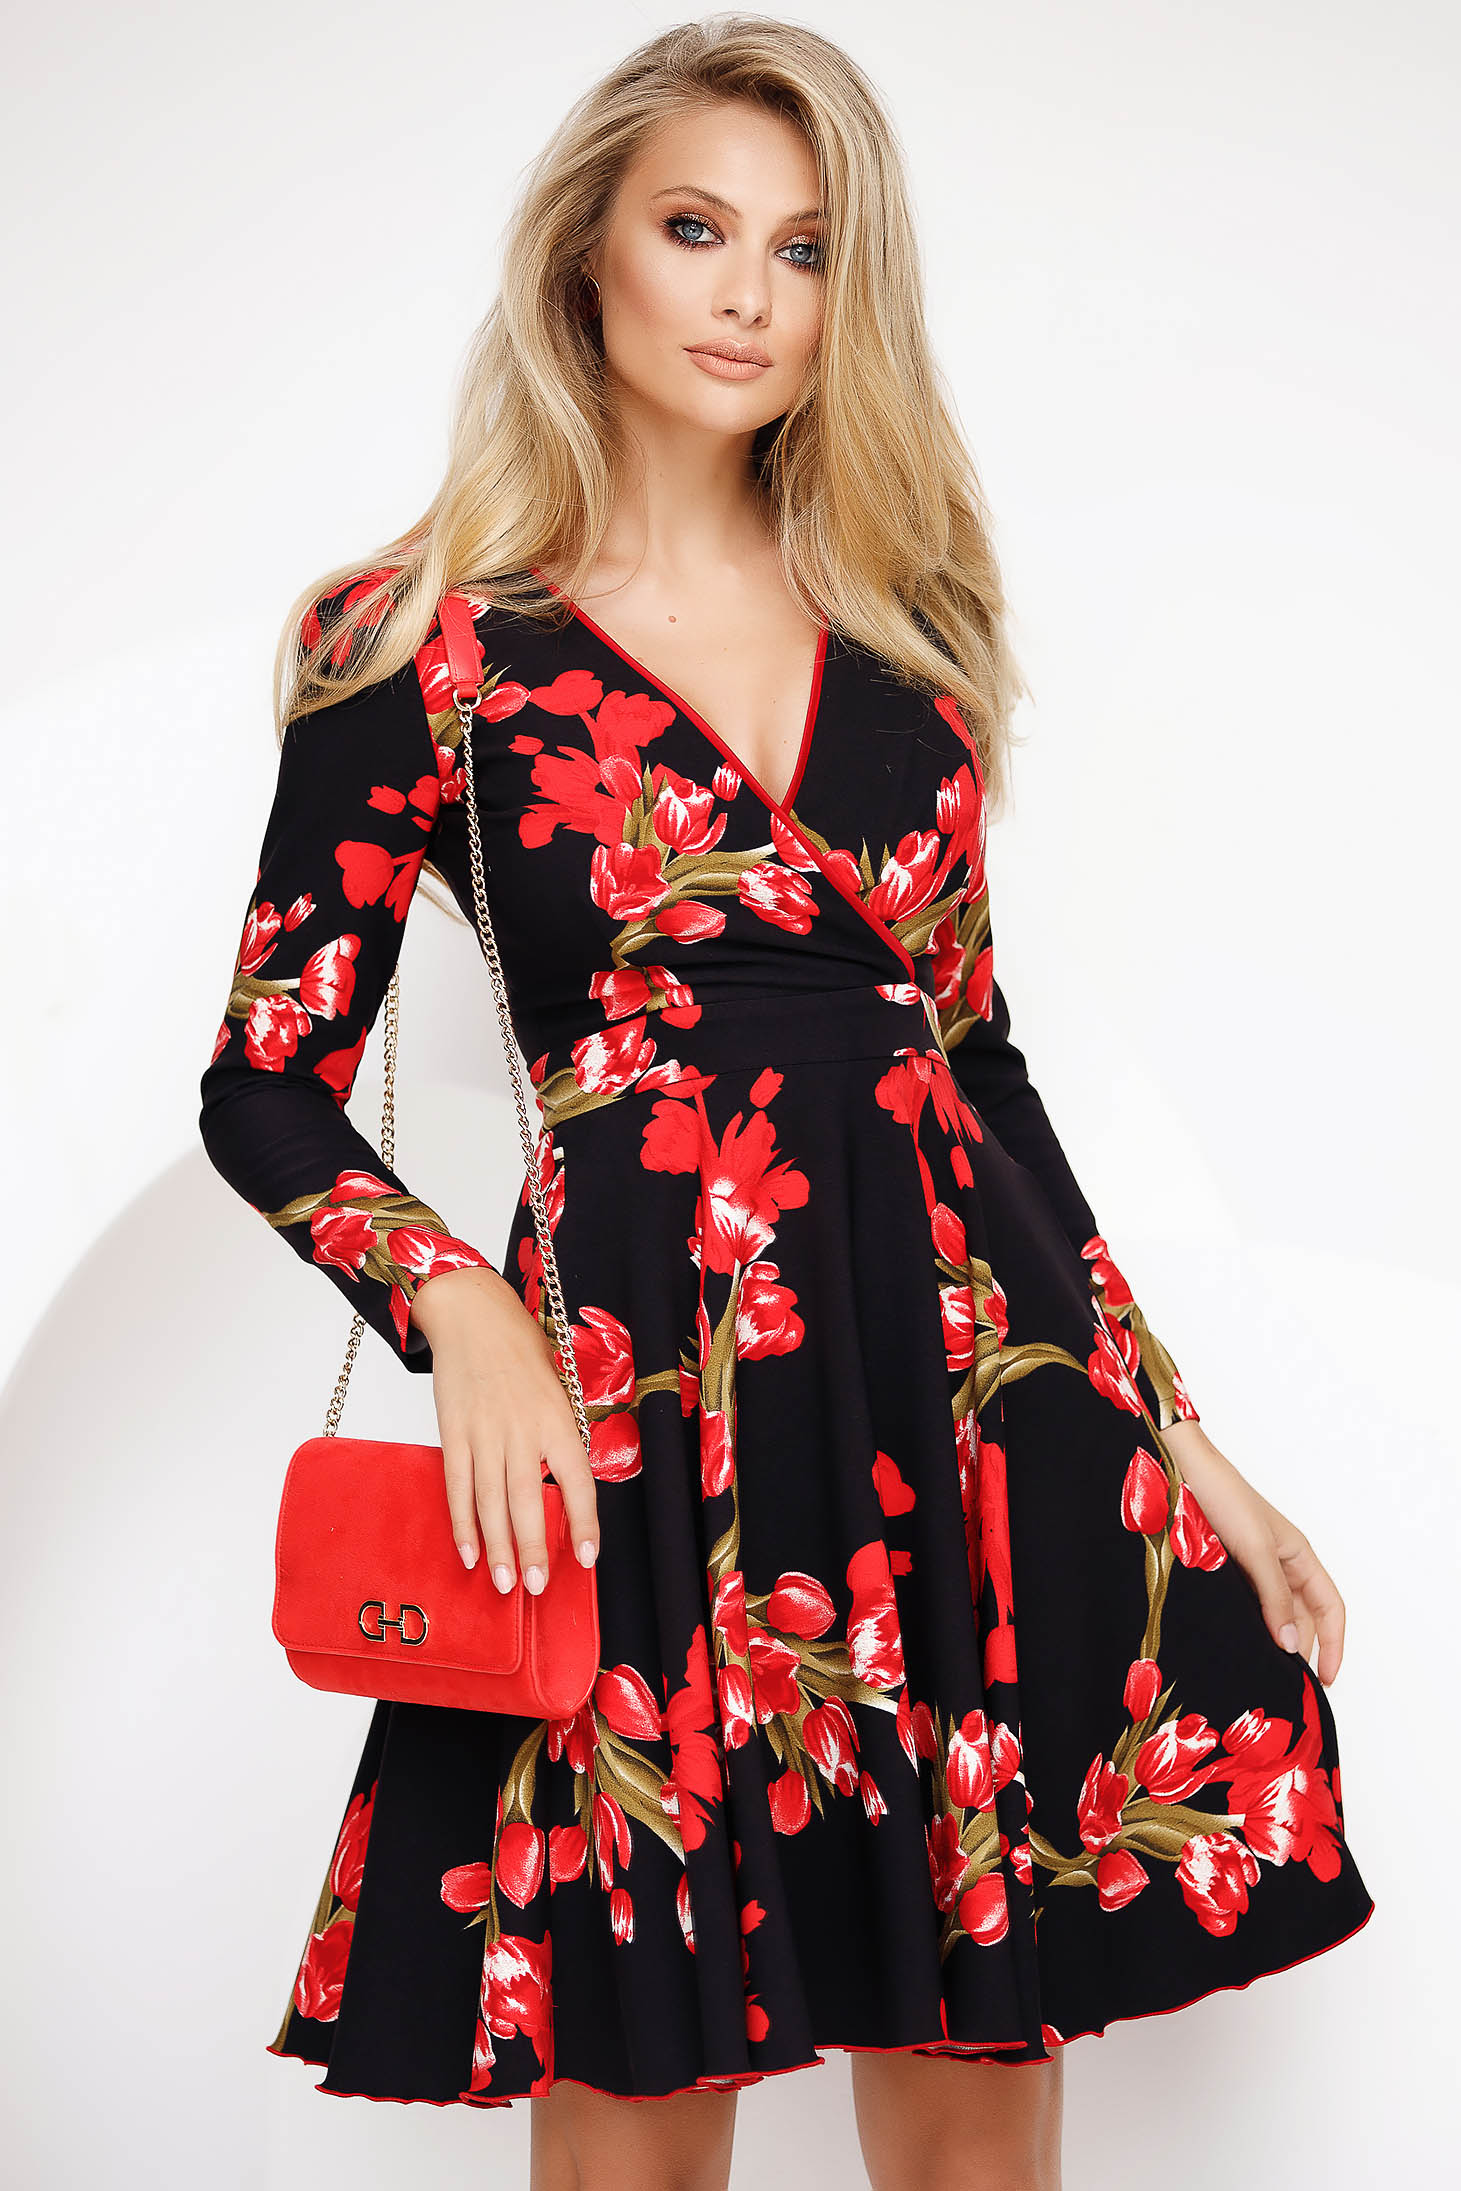 Red short cut daily dress cloche thin fabric